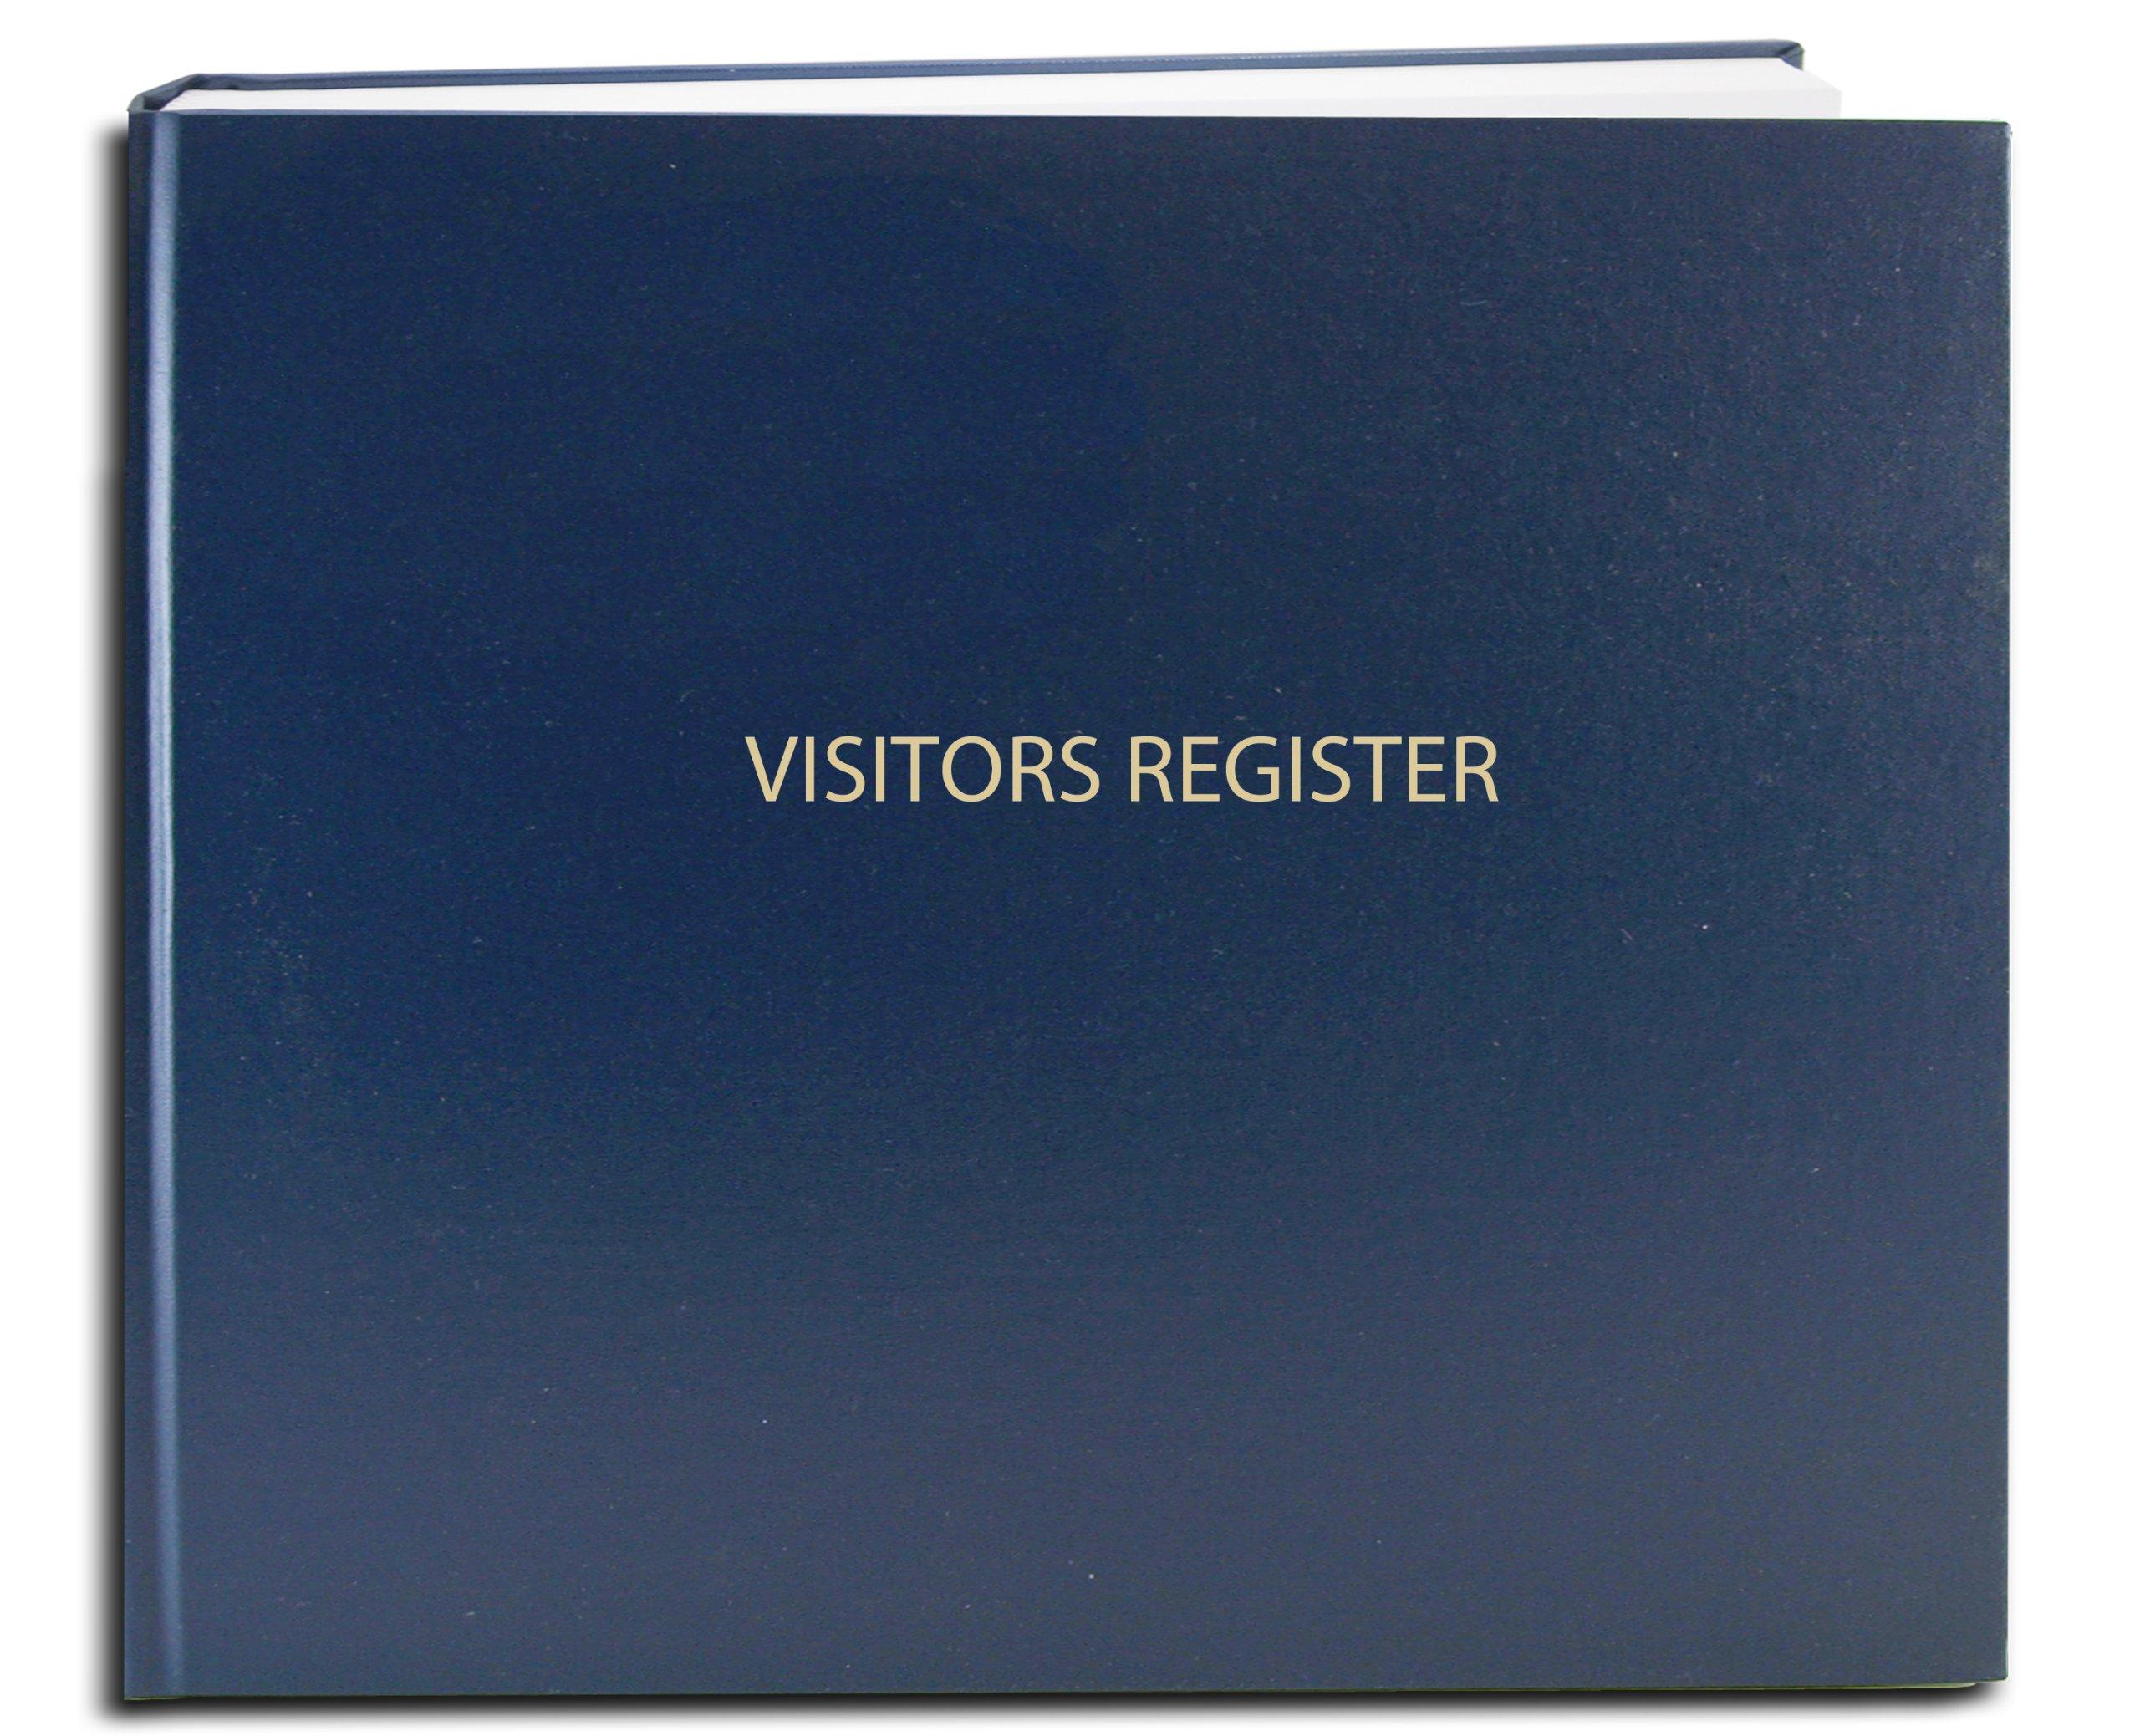 BookFactory Visitor Log Book / Visitor Register / Visitor Sign-In Book - 120 Pages, 8 7/8'' x 7'' - Blue Cover, Smyth Sewn Hardbound (LOG-120-Visitor-A-LBT34)